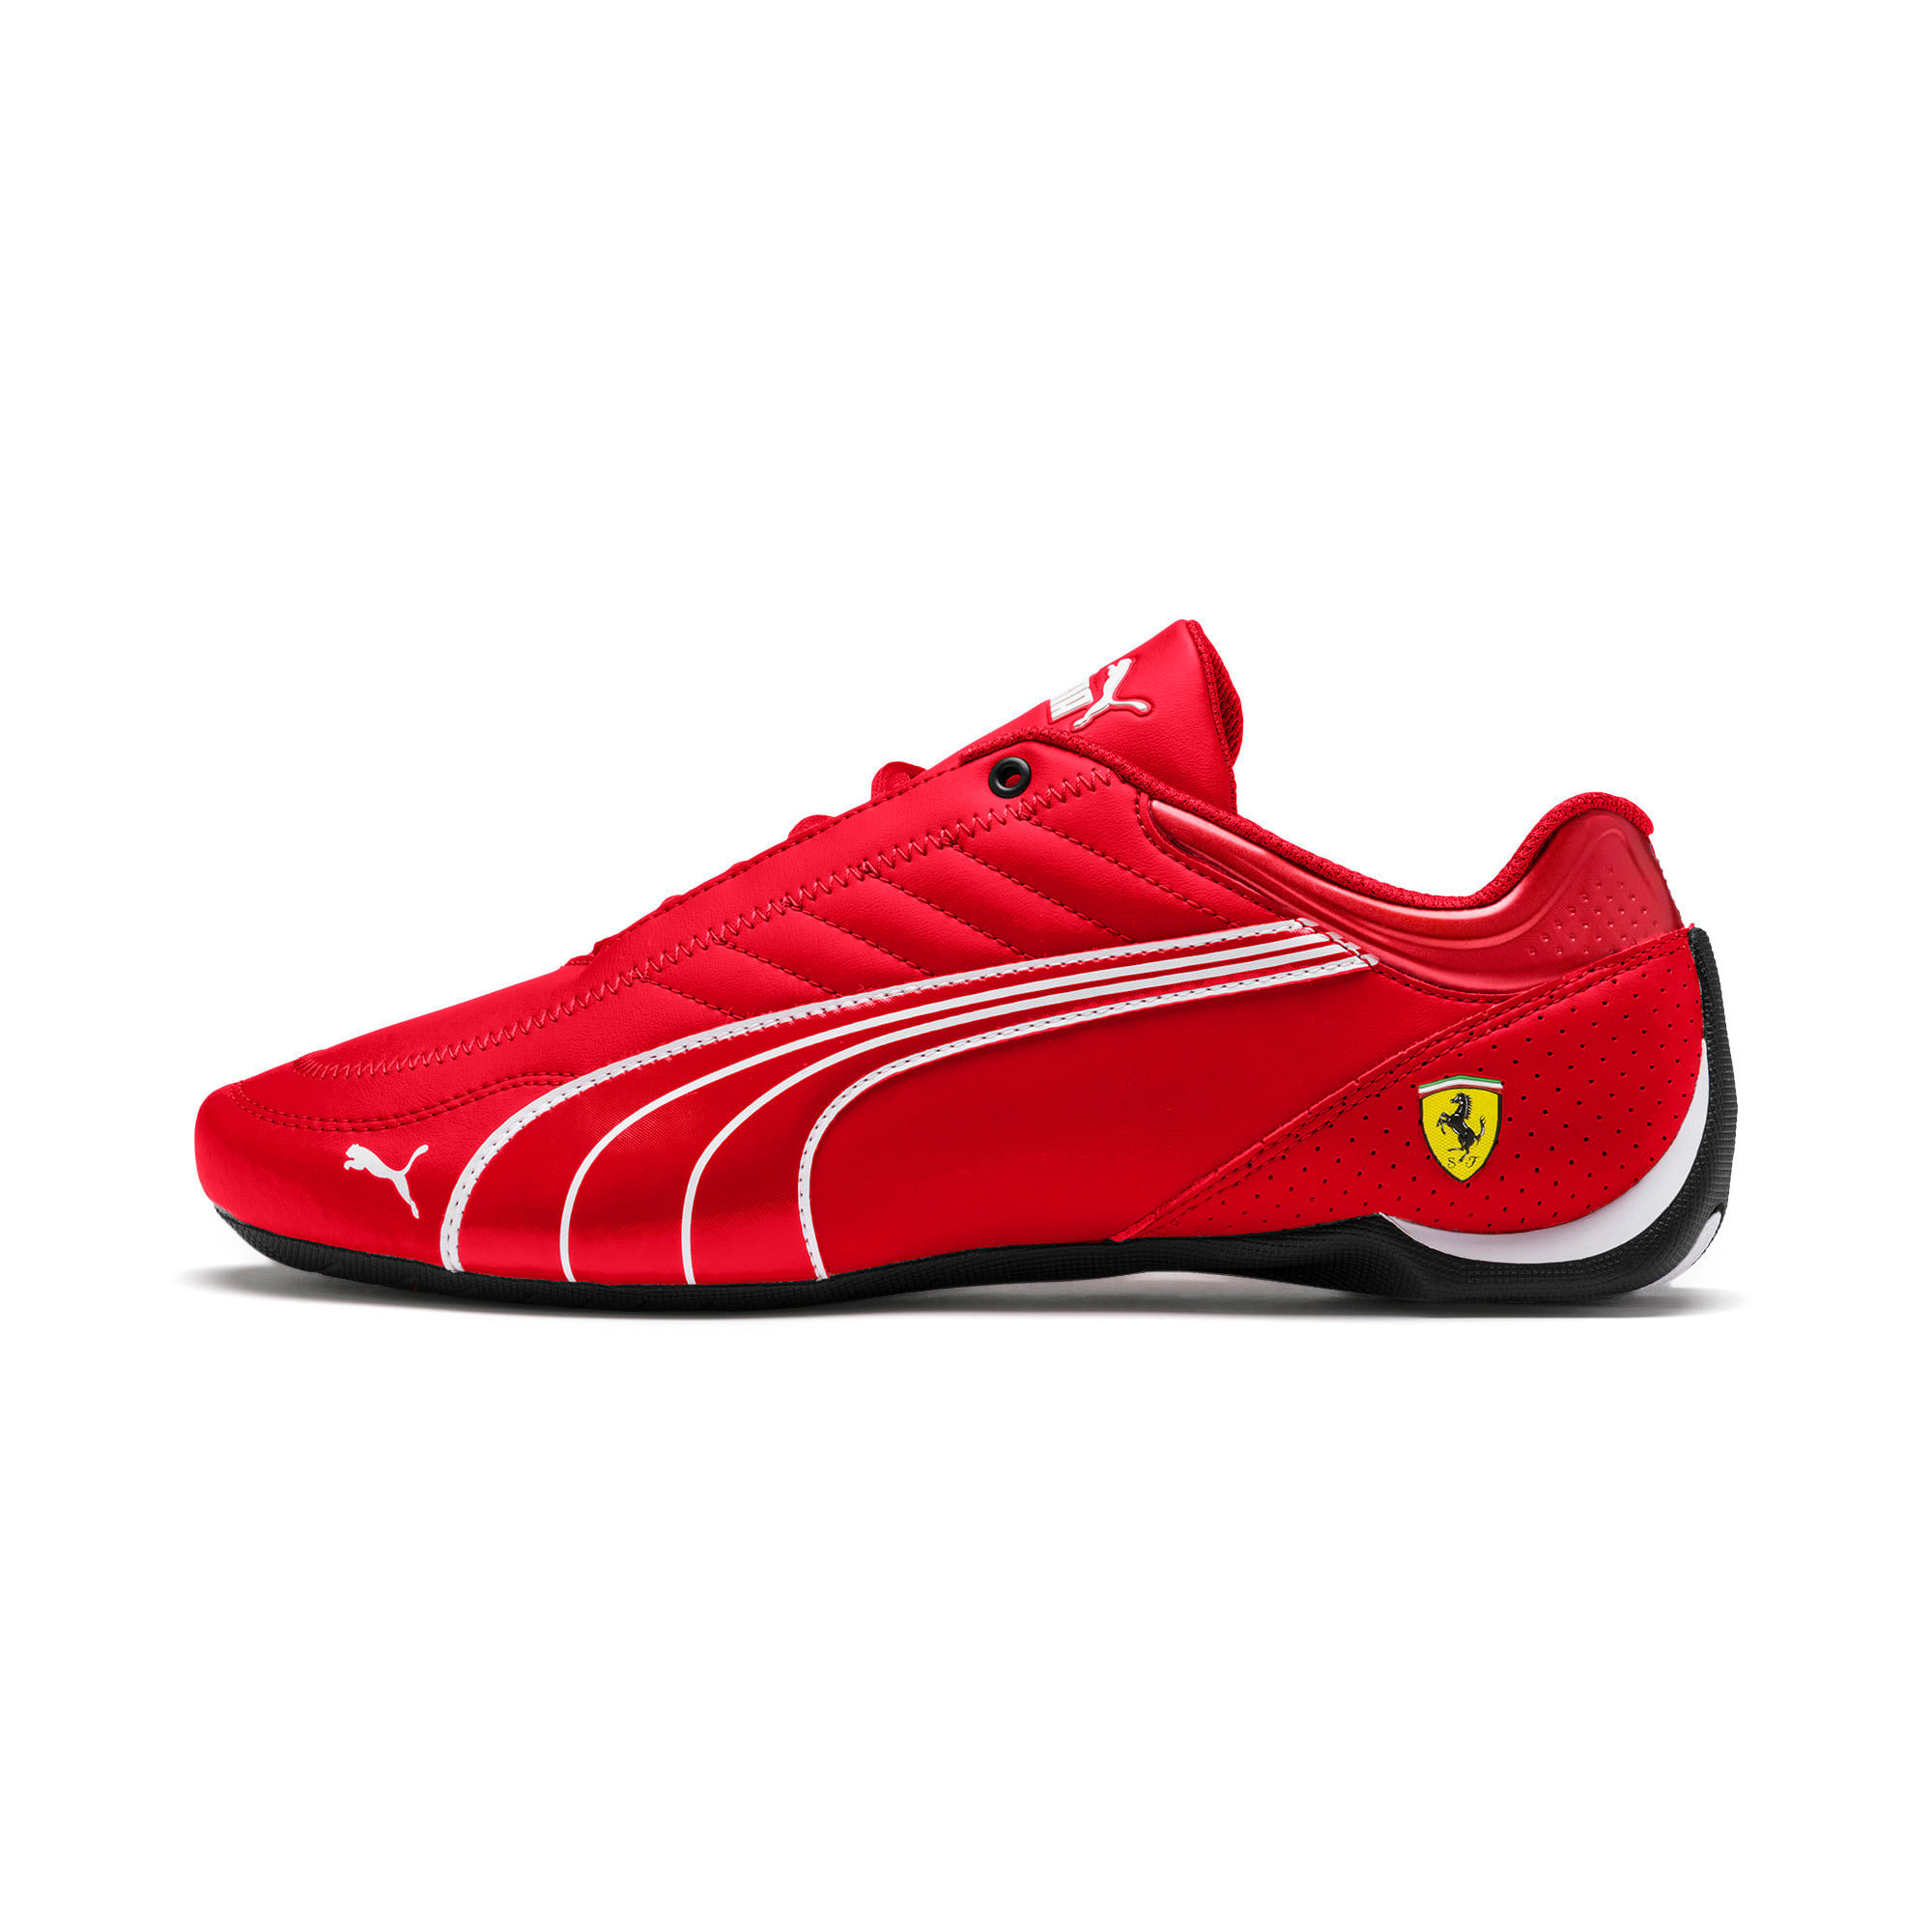 Scarpe da ginnastica Ferrari Future Kart Cat